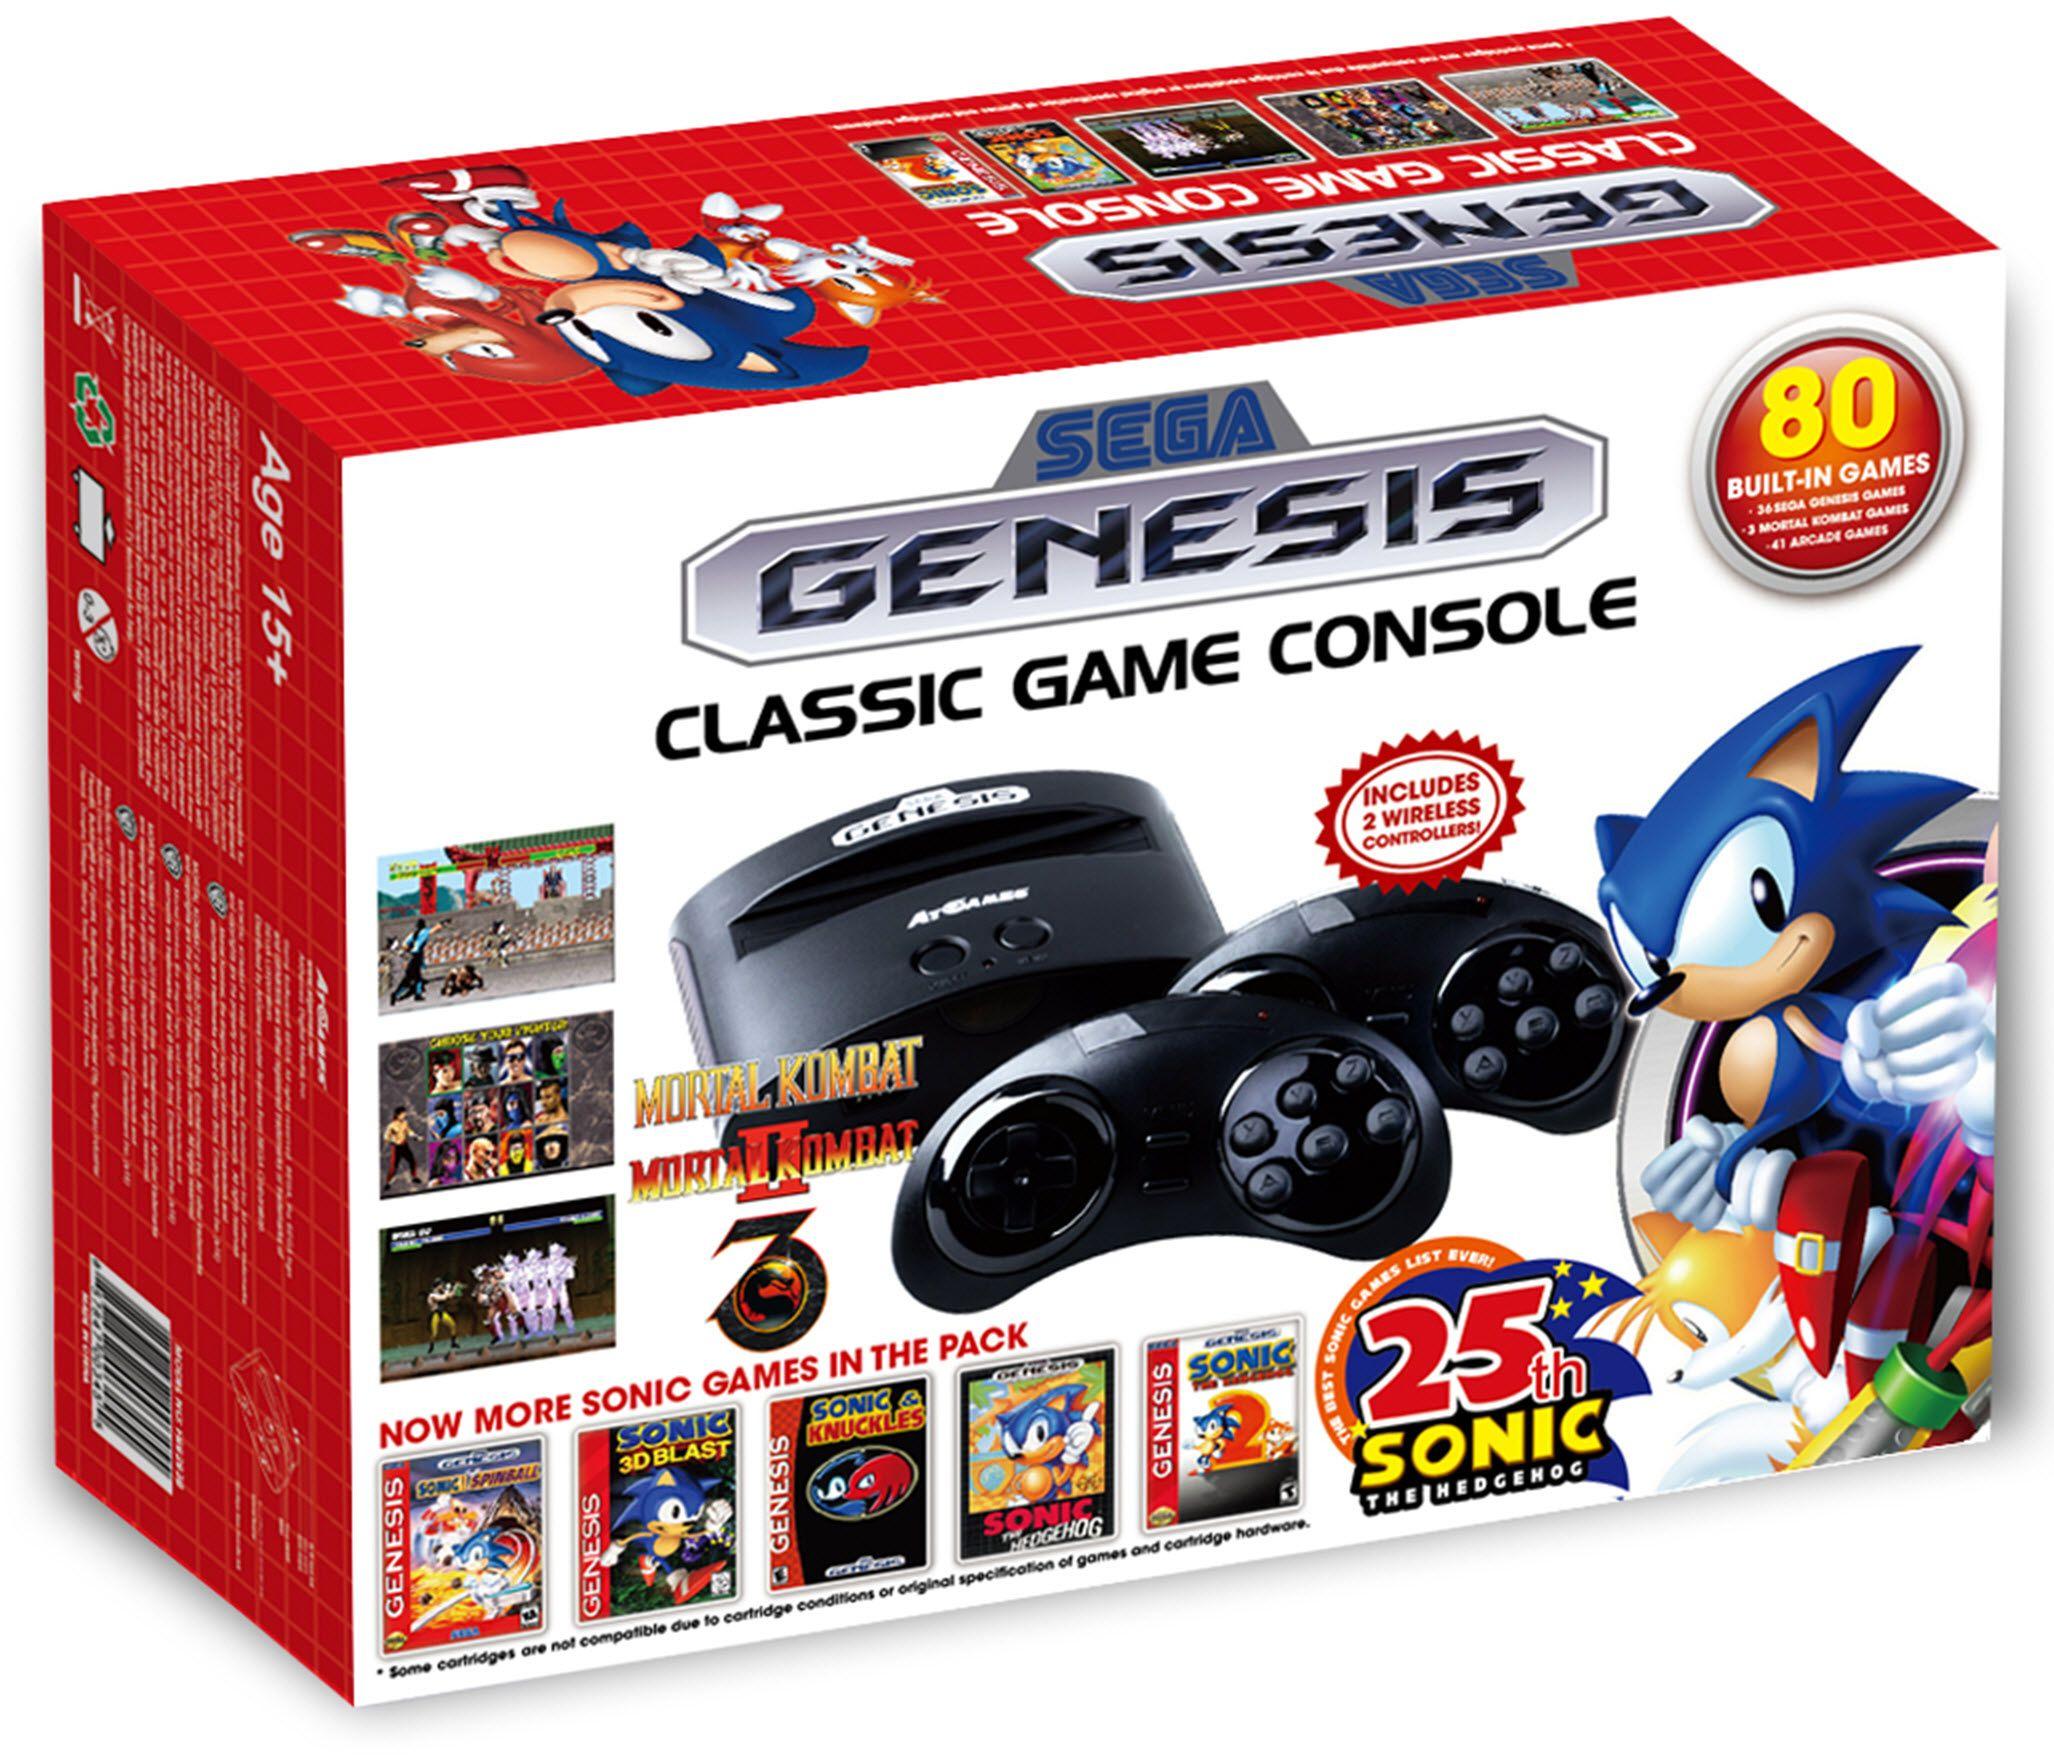 Sega genesis classic game console 2016 edition w 80 - Sega genesis classic game console games ...